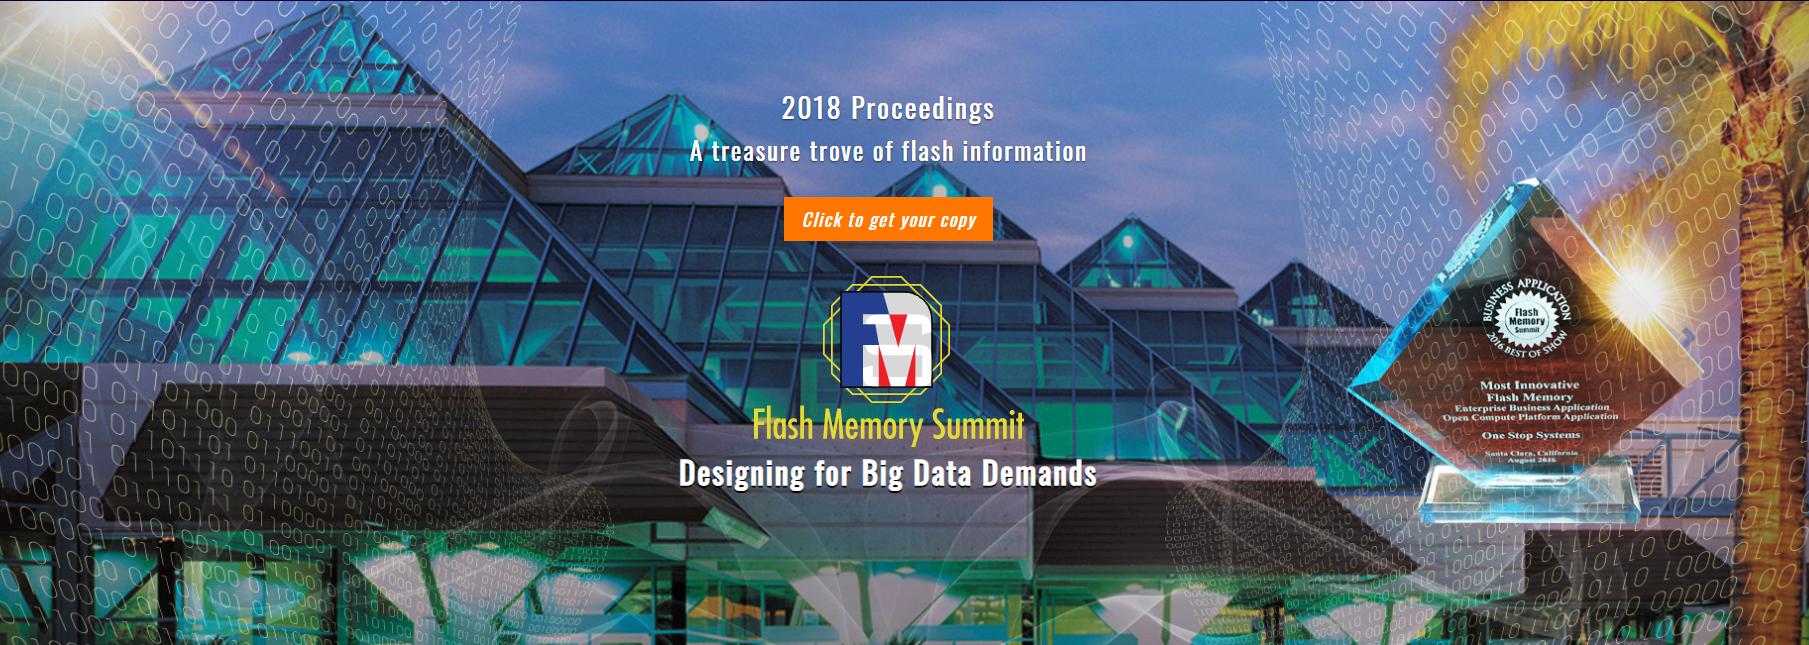 Flash Memory Summit